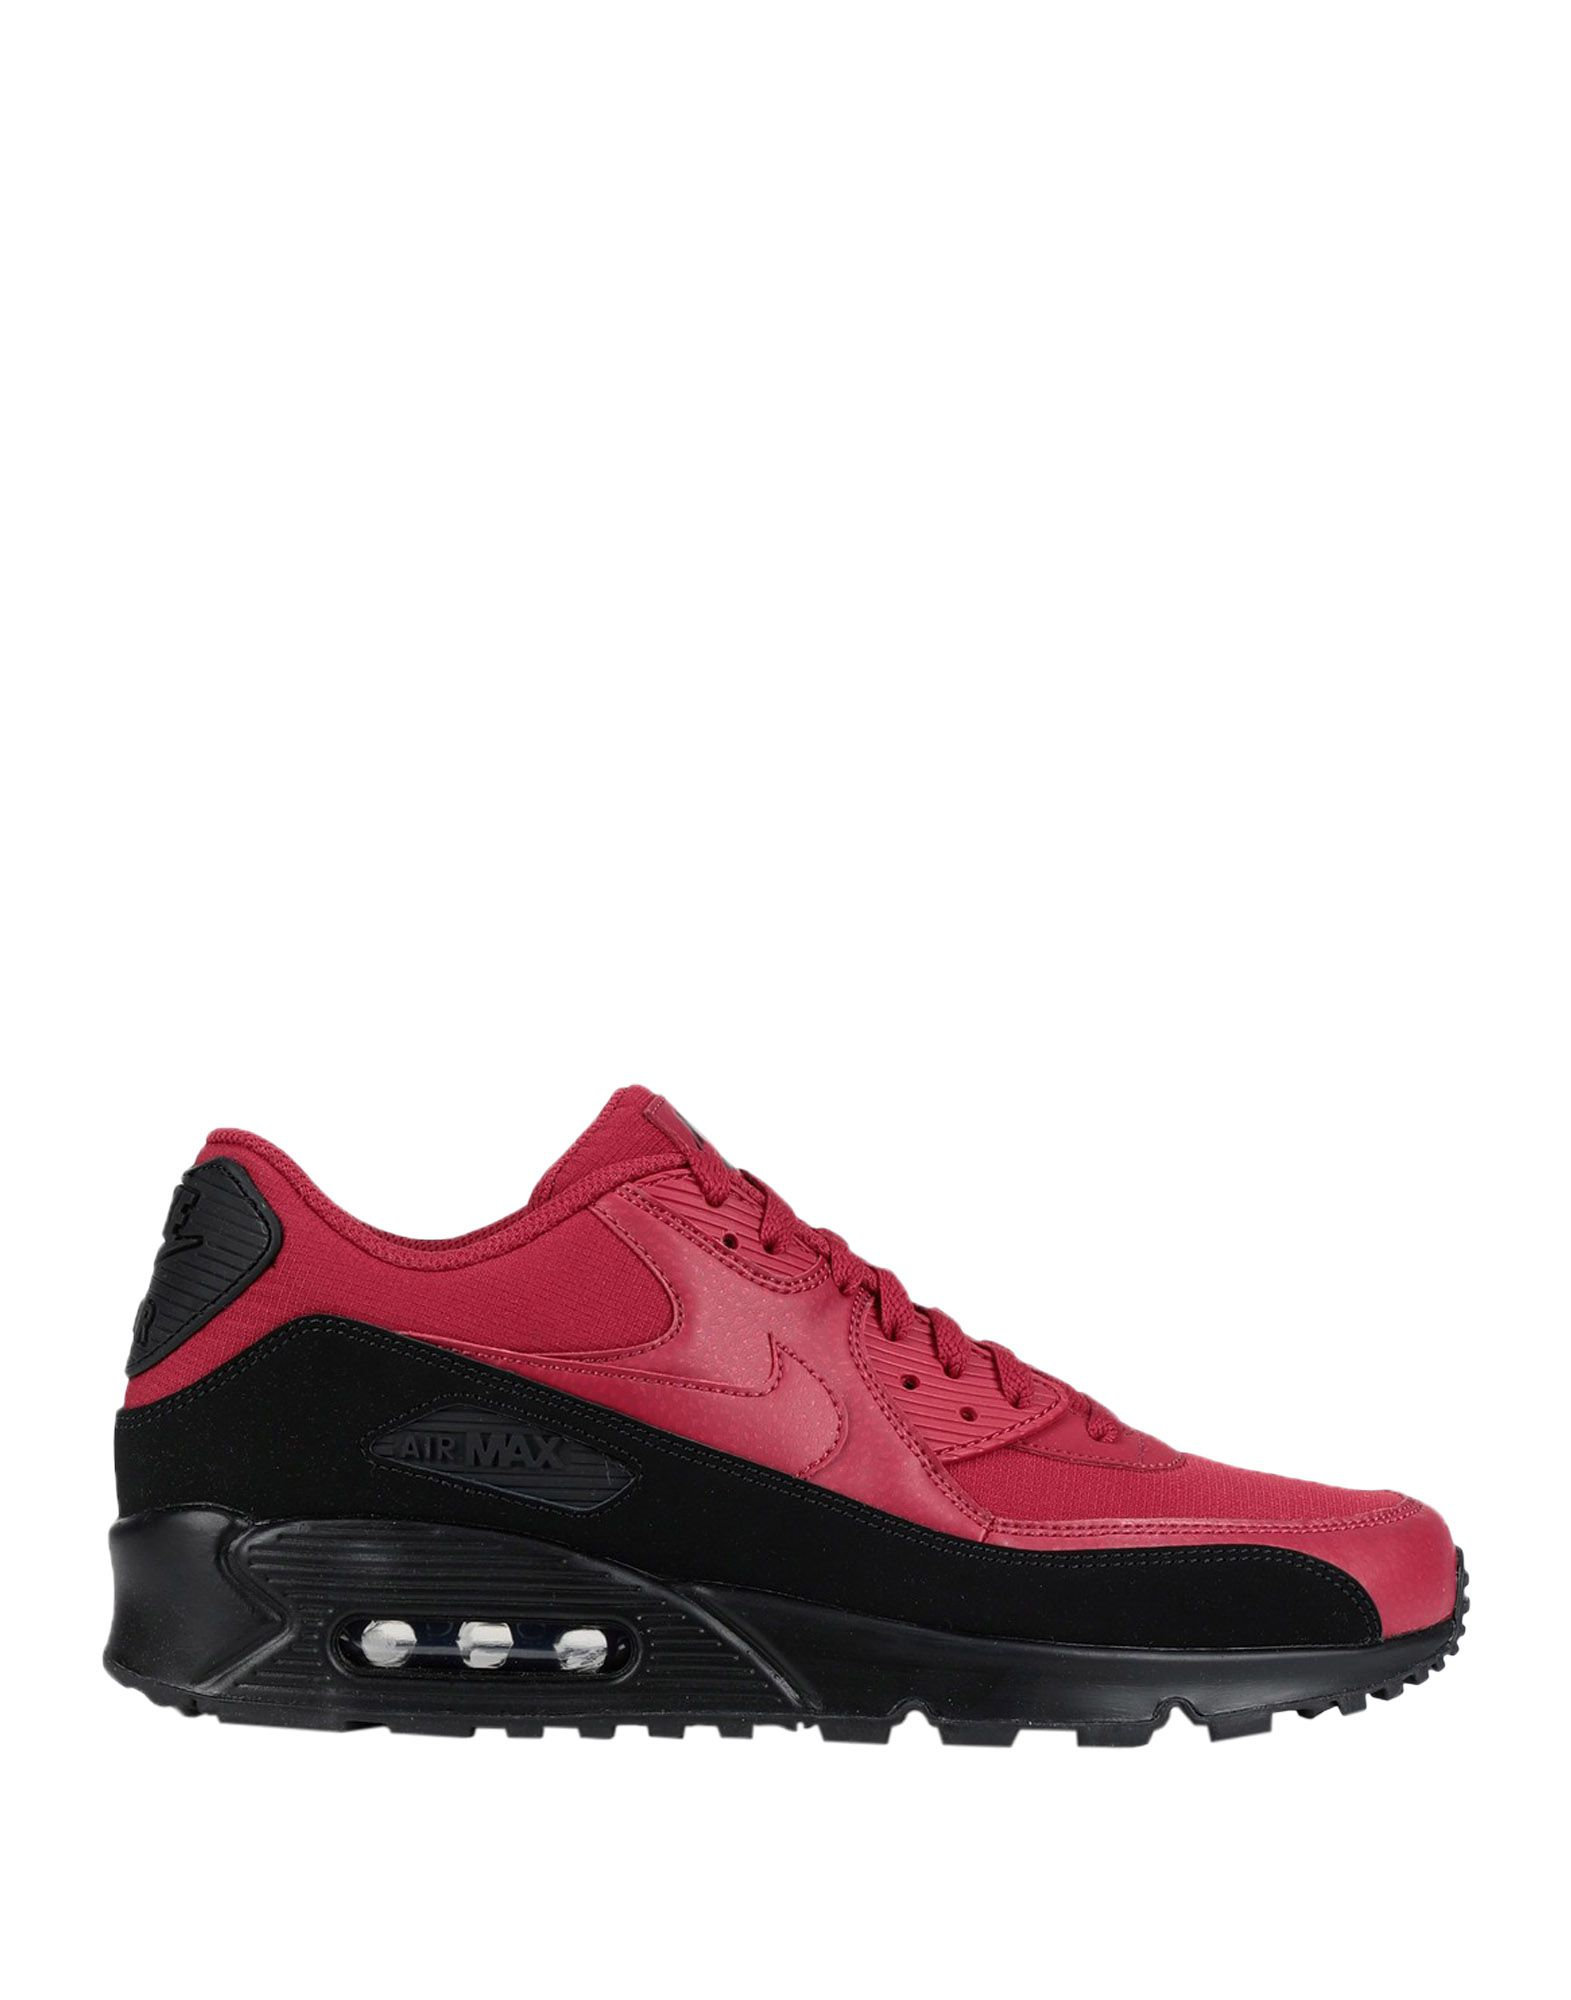 Nike   Air Max 90 Essential  11543424XO Gute Qualität beliebte Schuhe